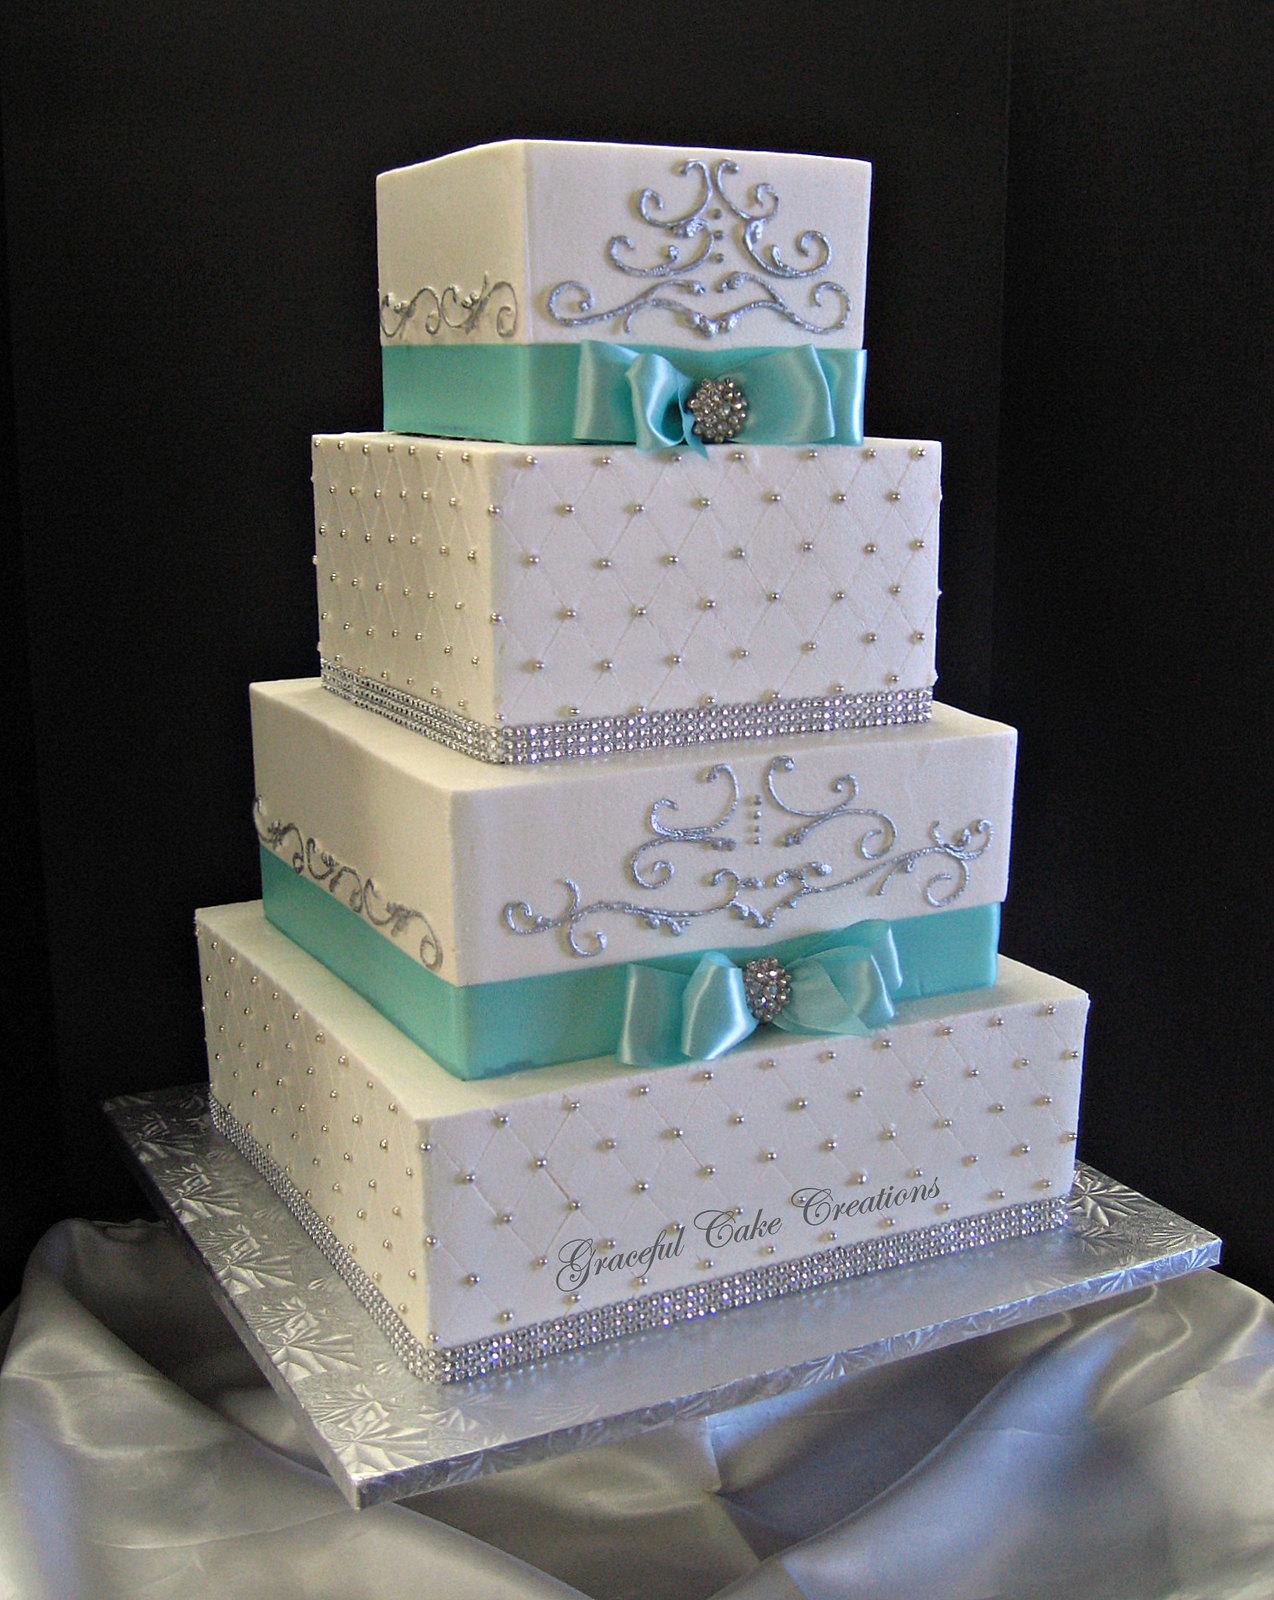 Elegant Tiffany Blue and White Square Wedding Cake with